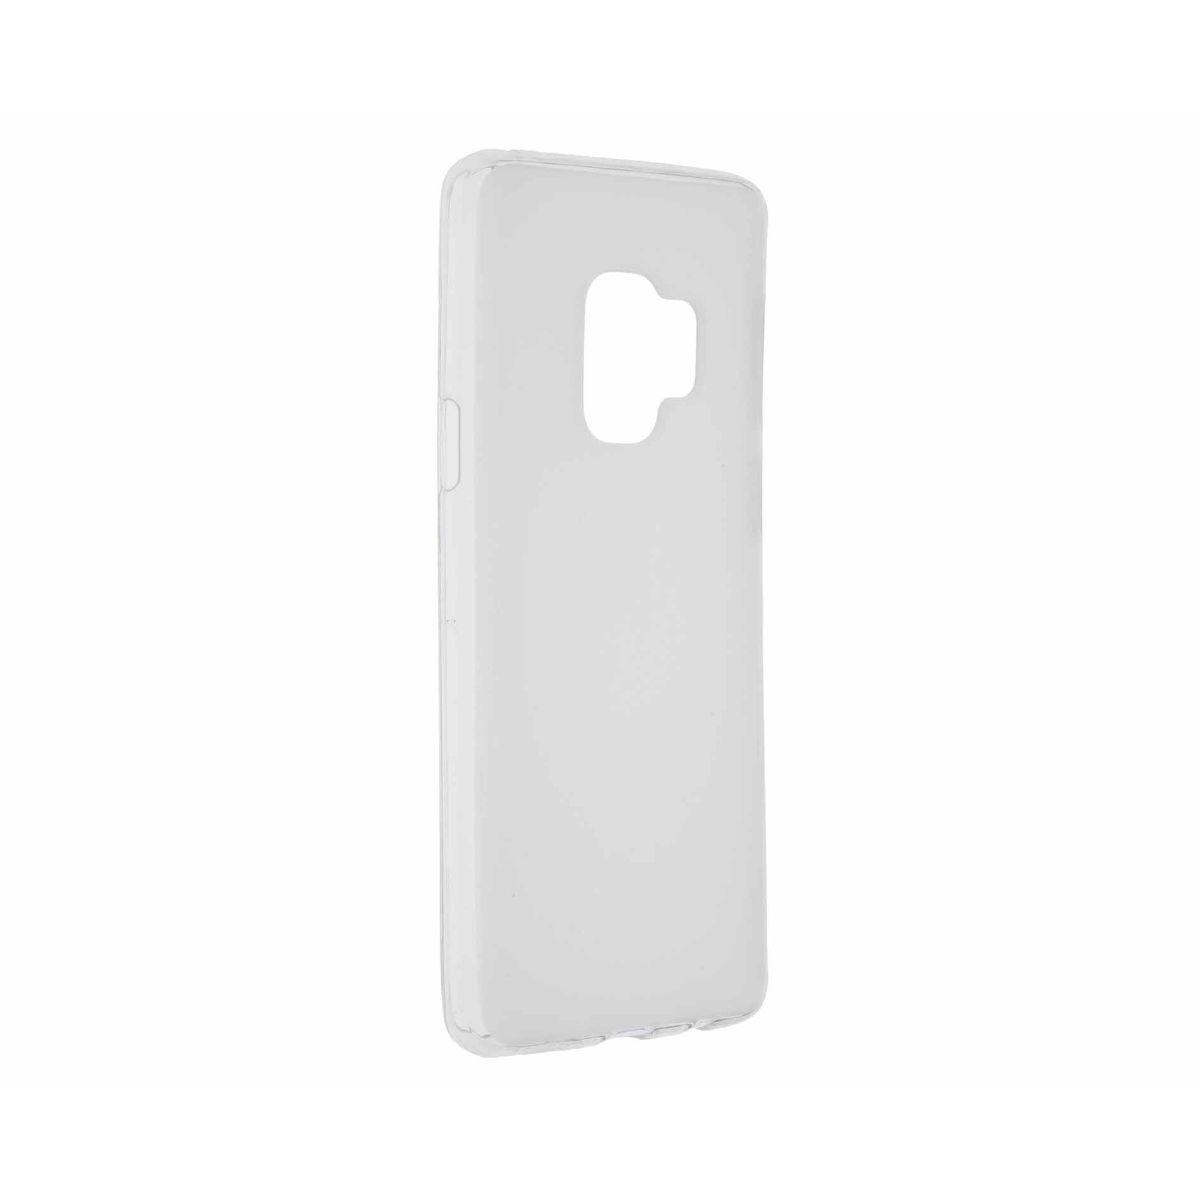 Case it Samsung Galaxy S9 Protective Case